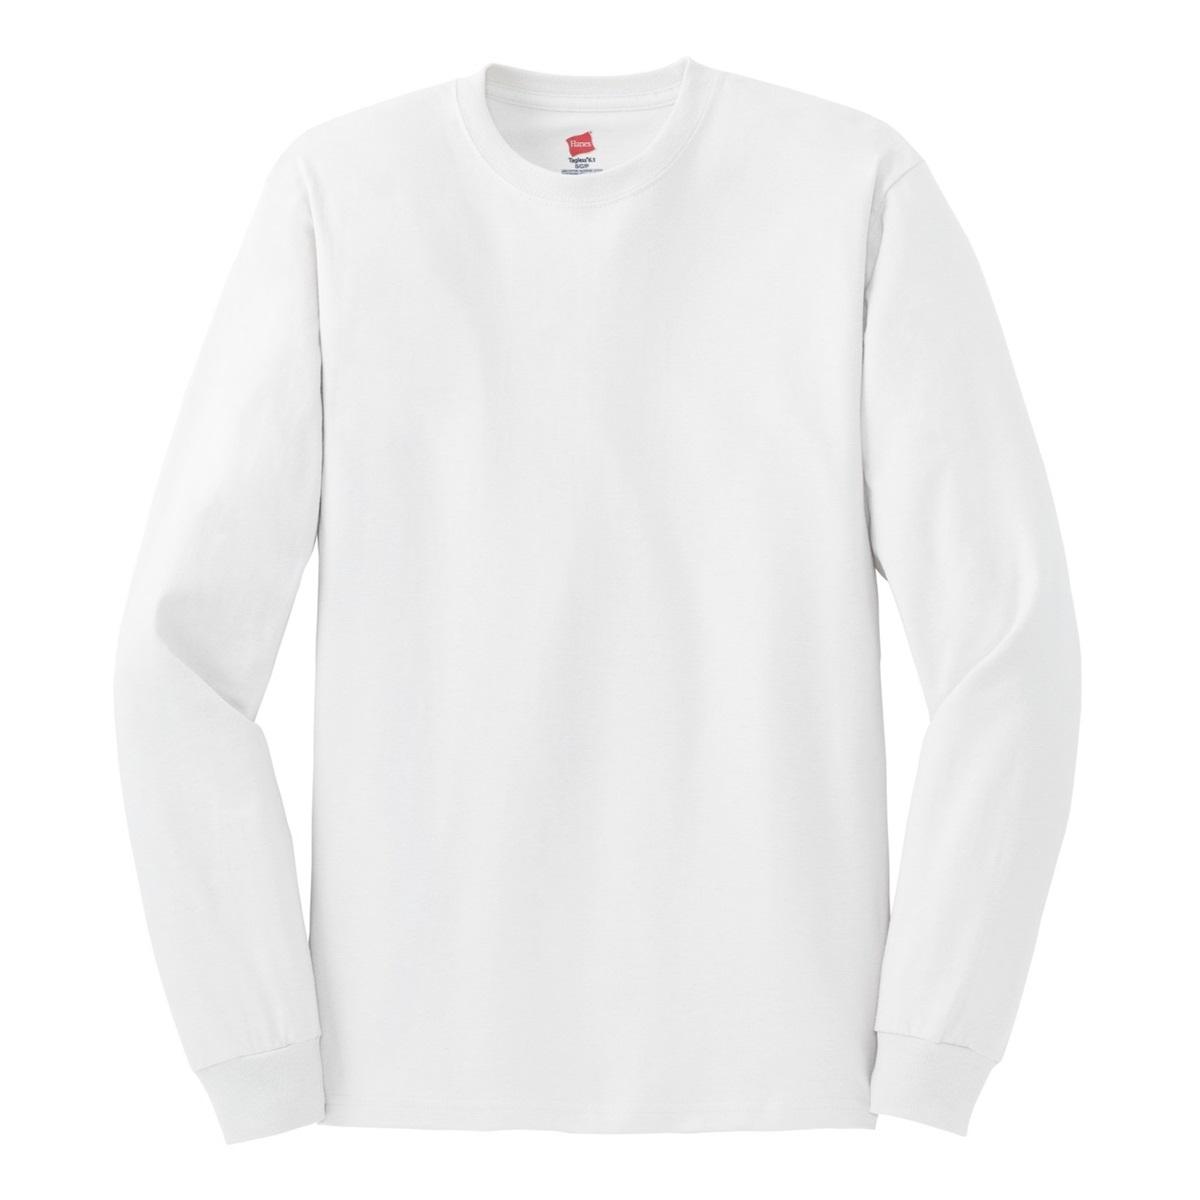 Hanes 5586 tagless cotton long sleeve t shirt white for White cotton long sleeve t shirt